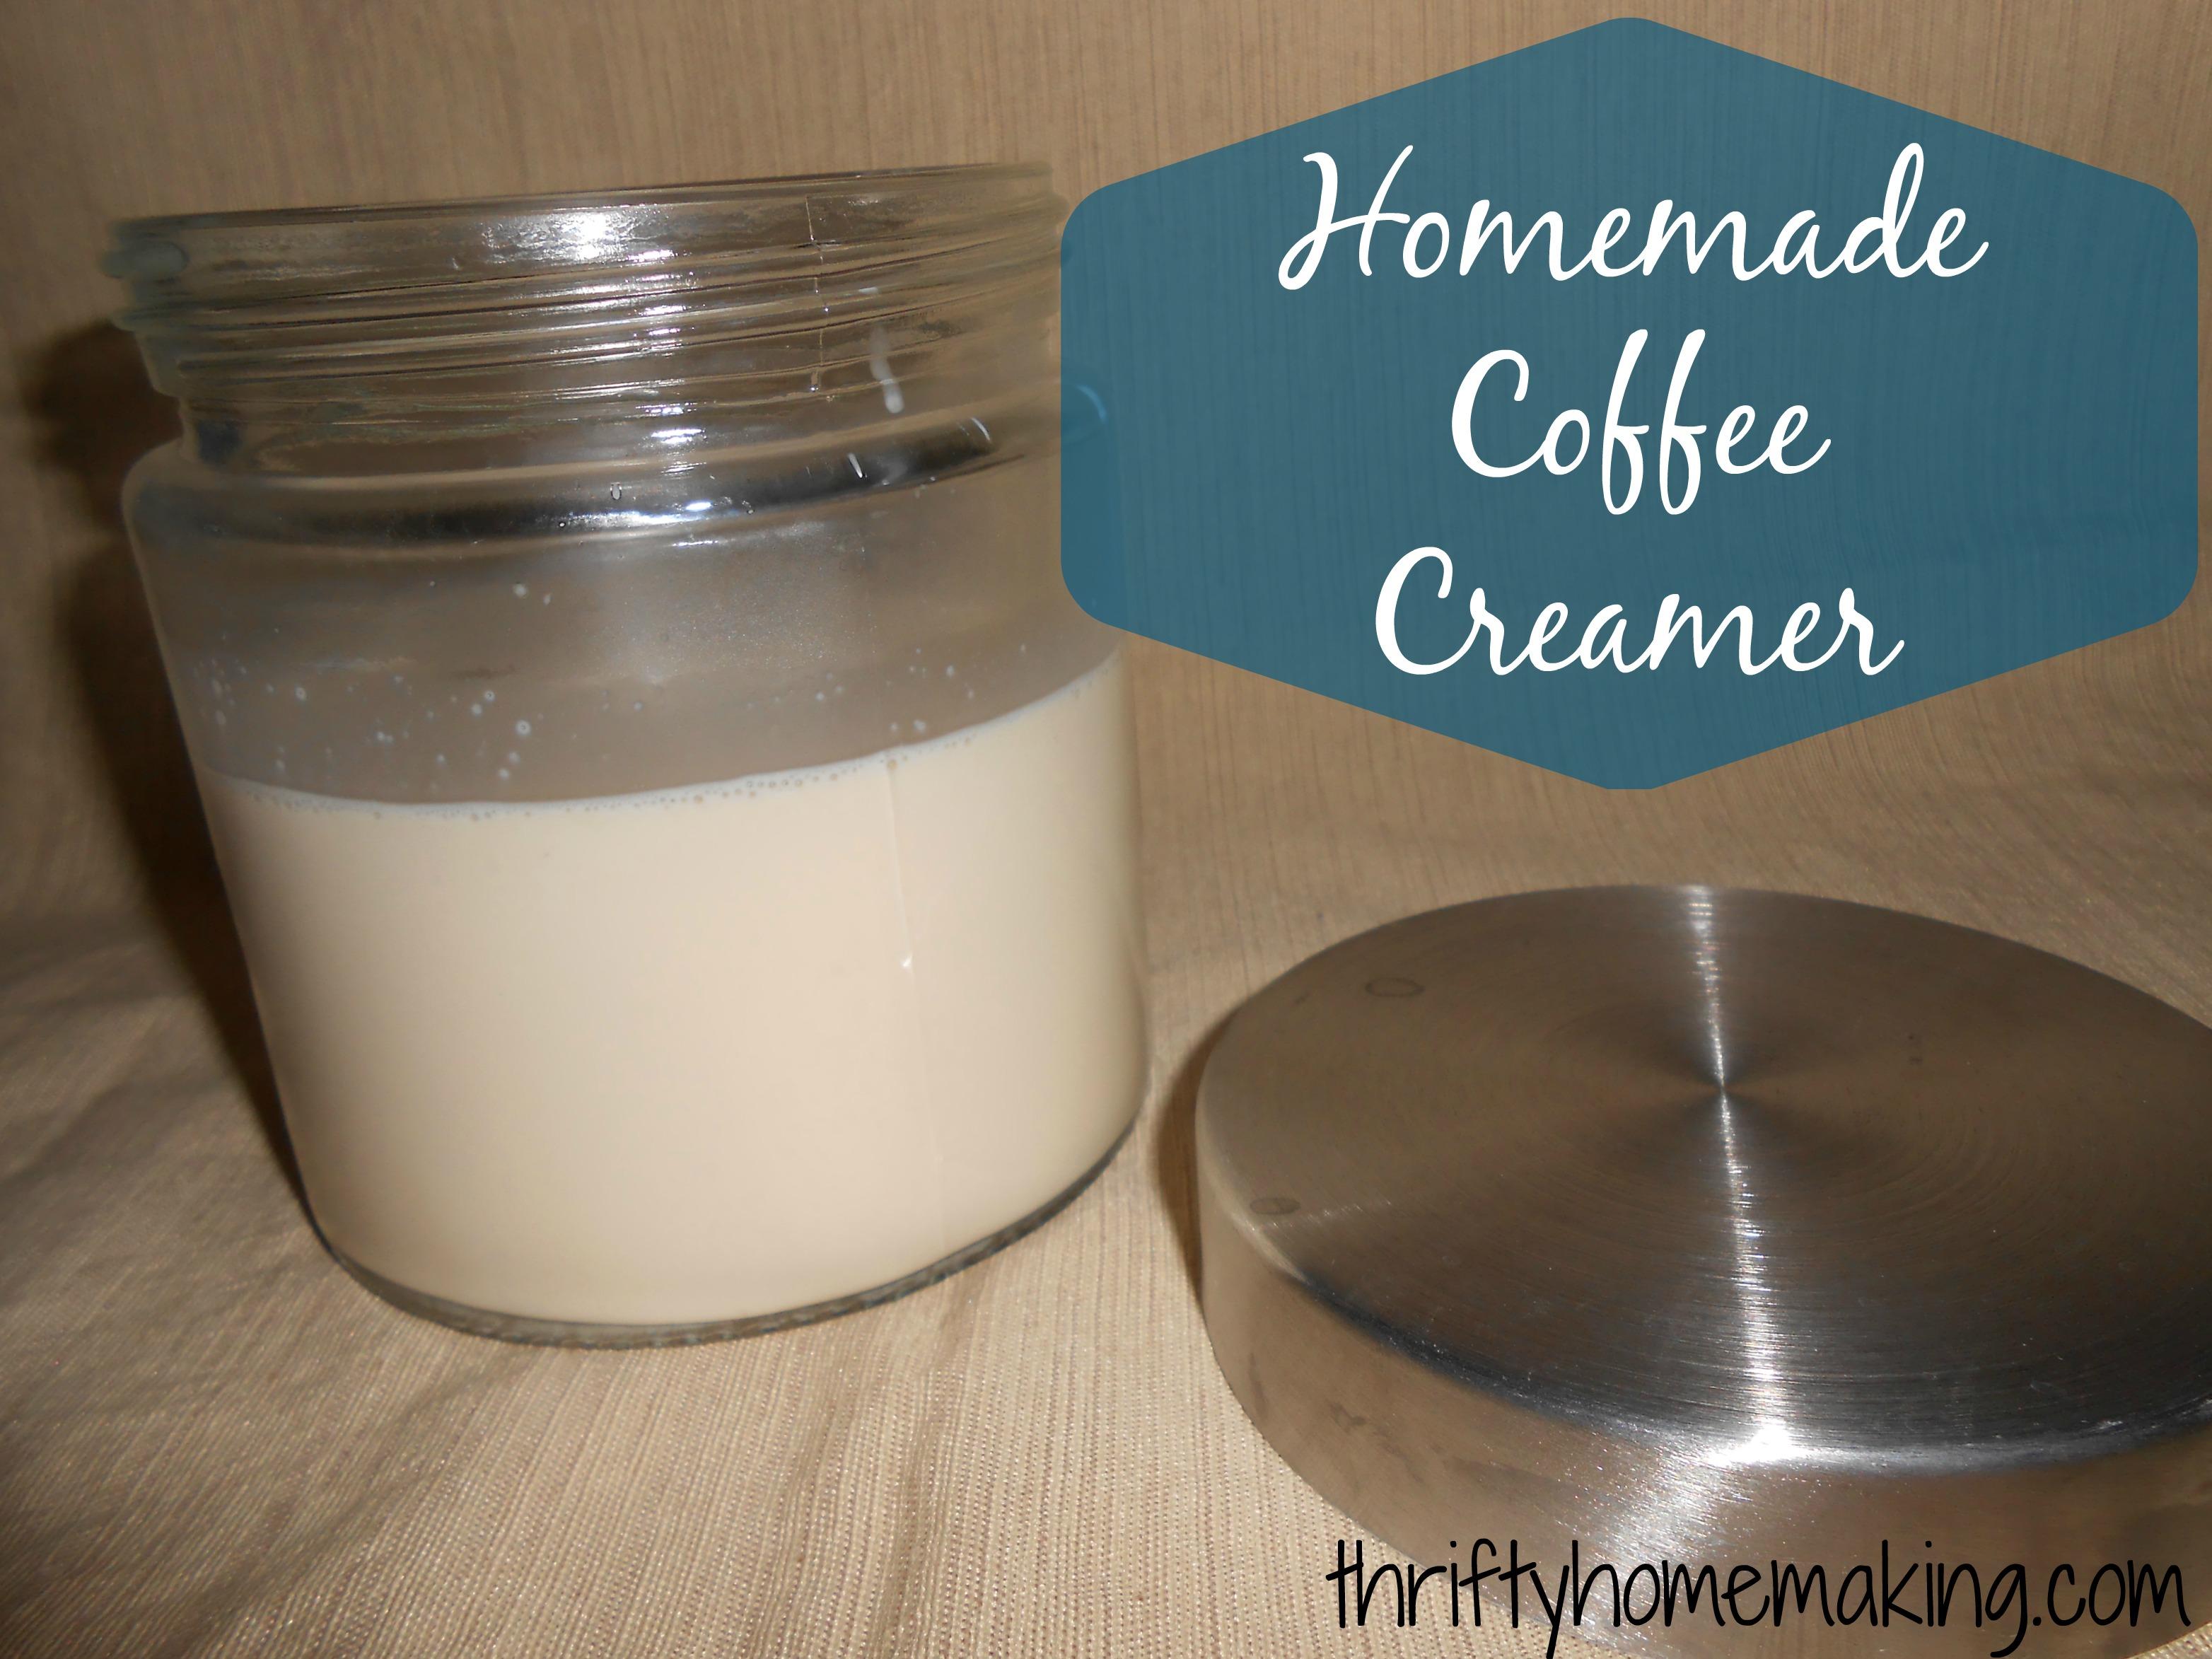 Homemade Coffee Creamer - Laura Sue Shaw